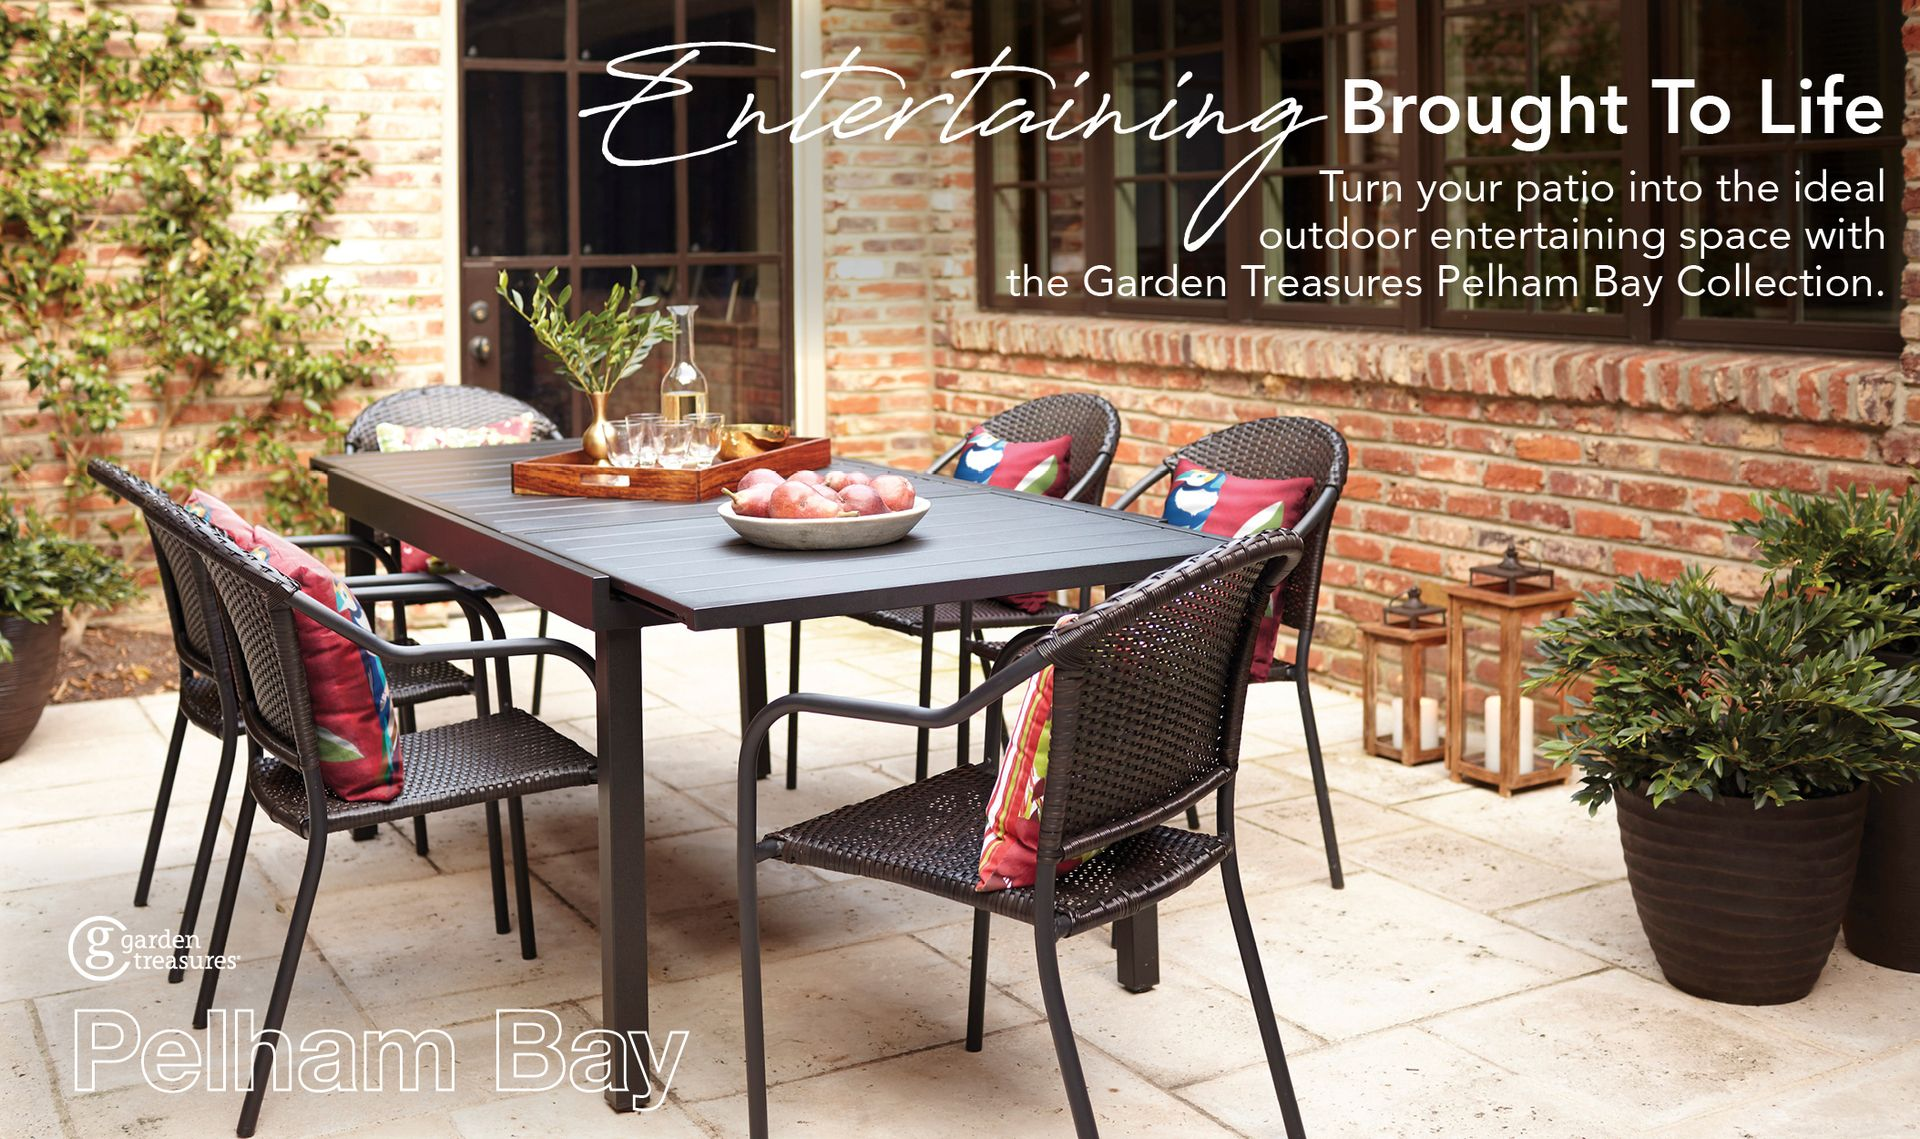 Garden Treasures Pelham Bay Rectangle Extendable Table Dining